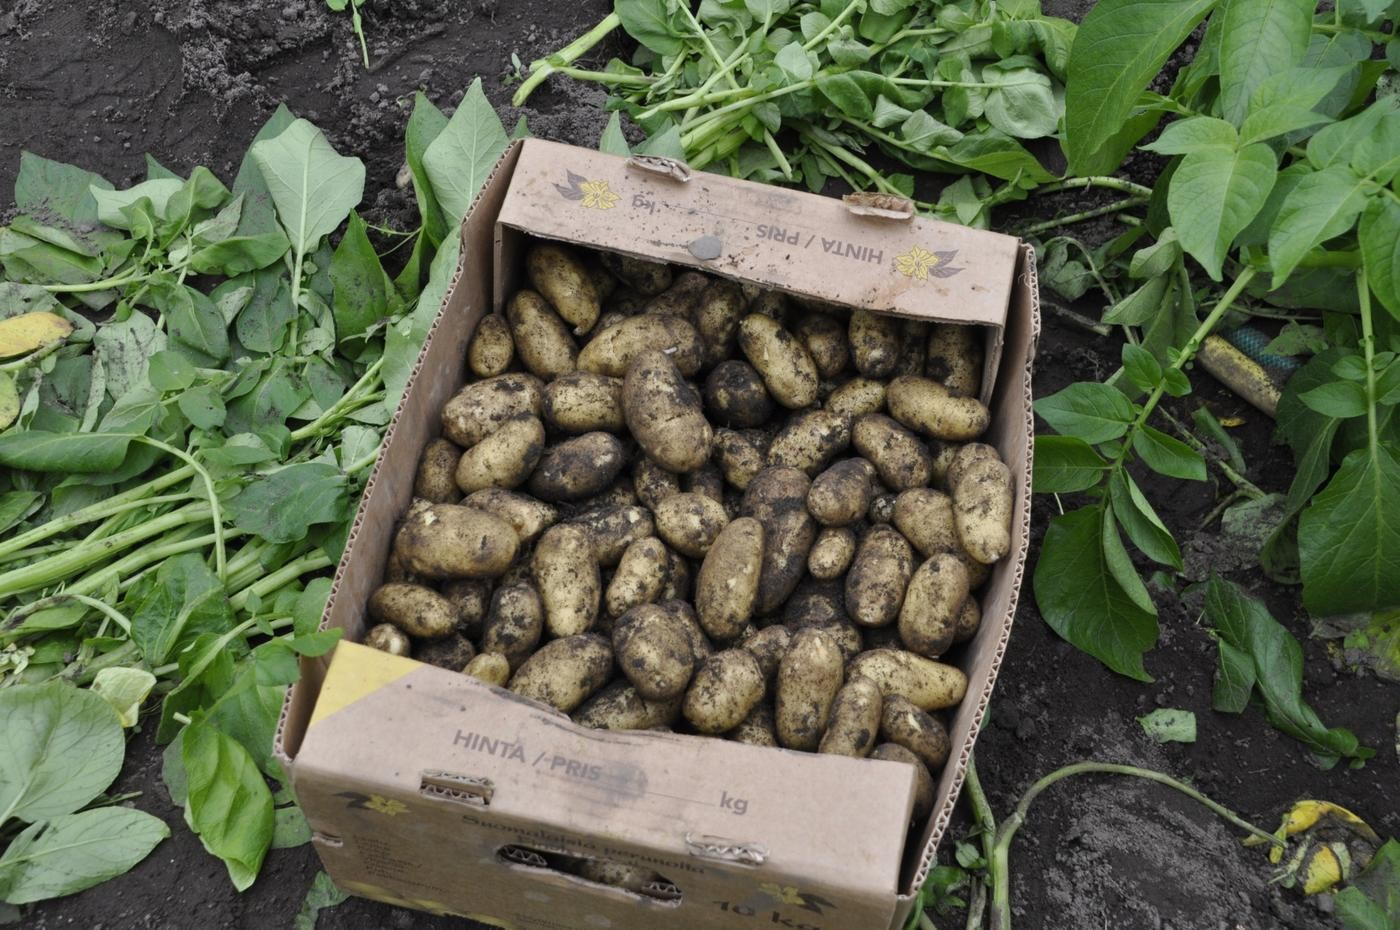 potatis i en låda